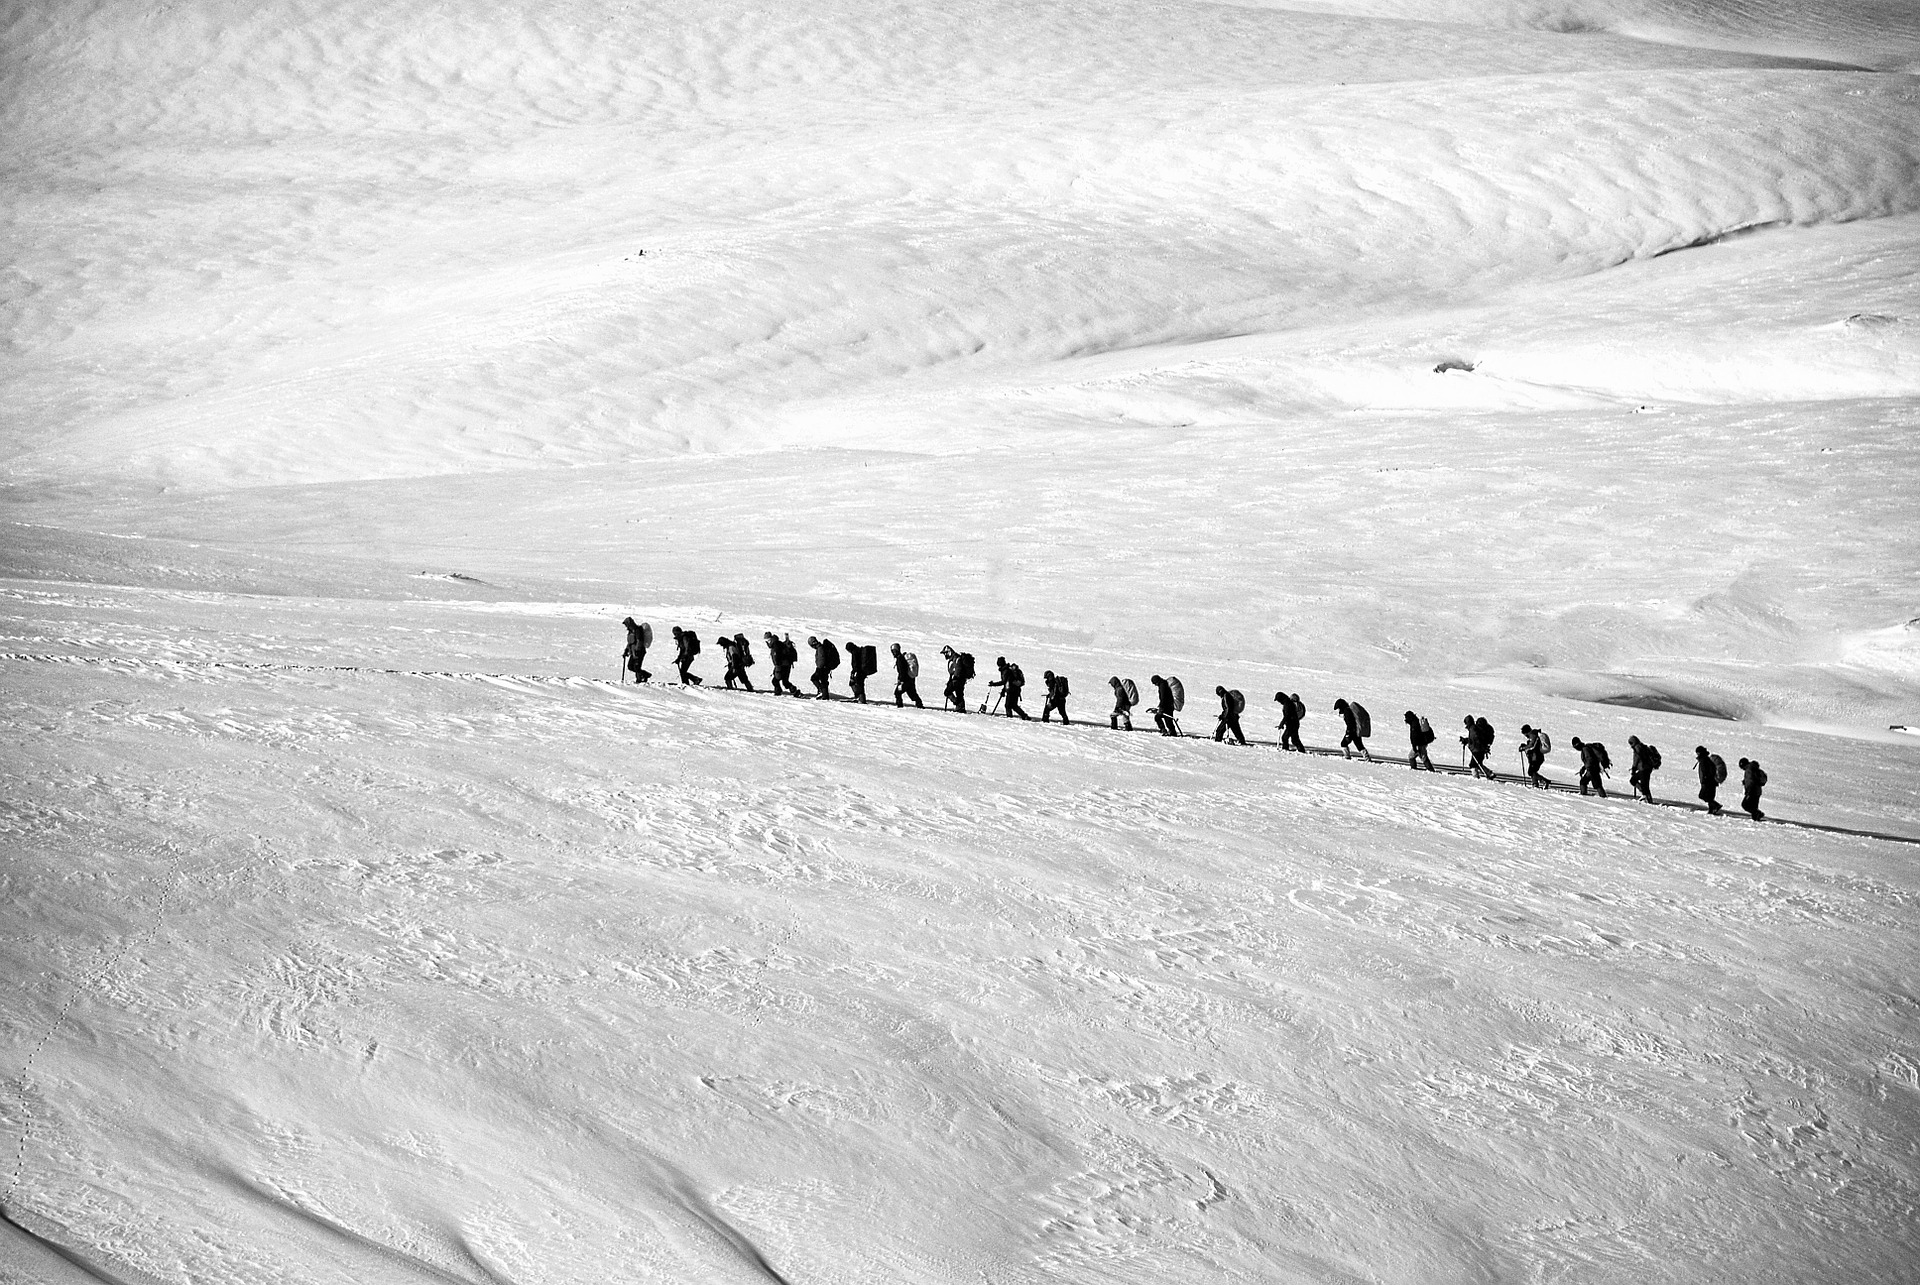 trekking-gruppo